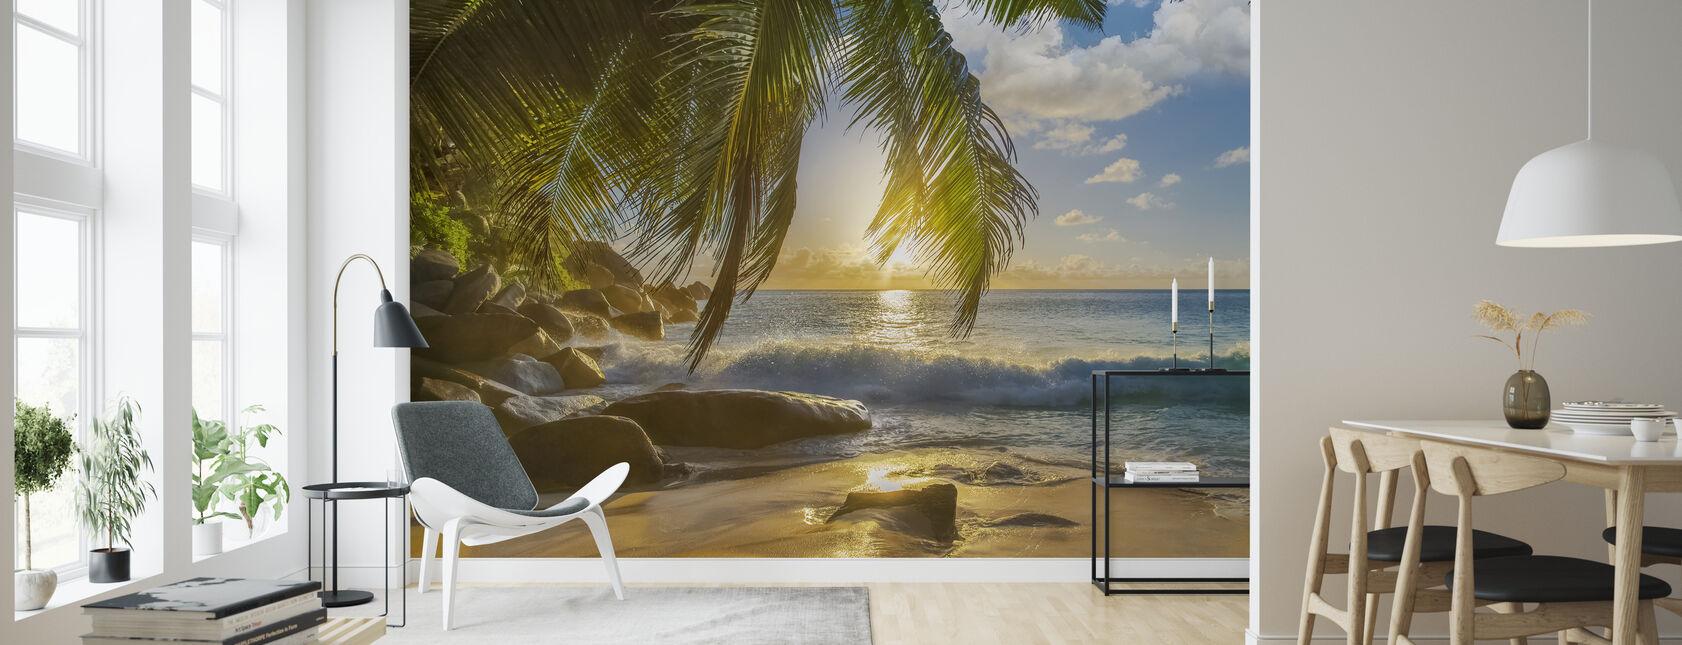 Beach Rocks Waves - Wallpaper - Living Room